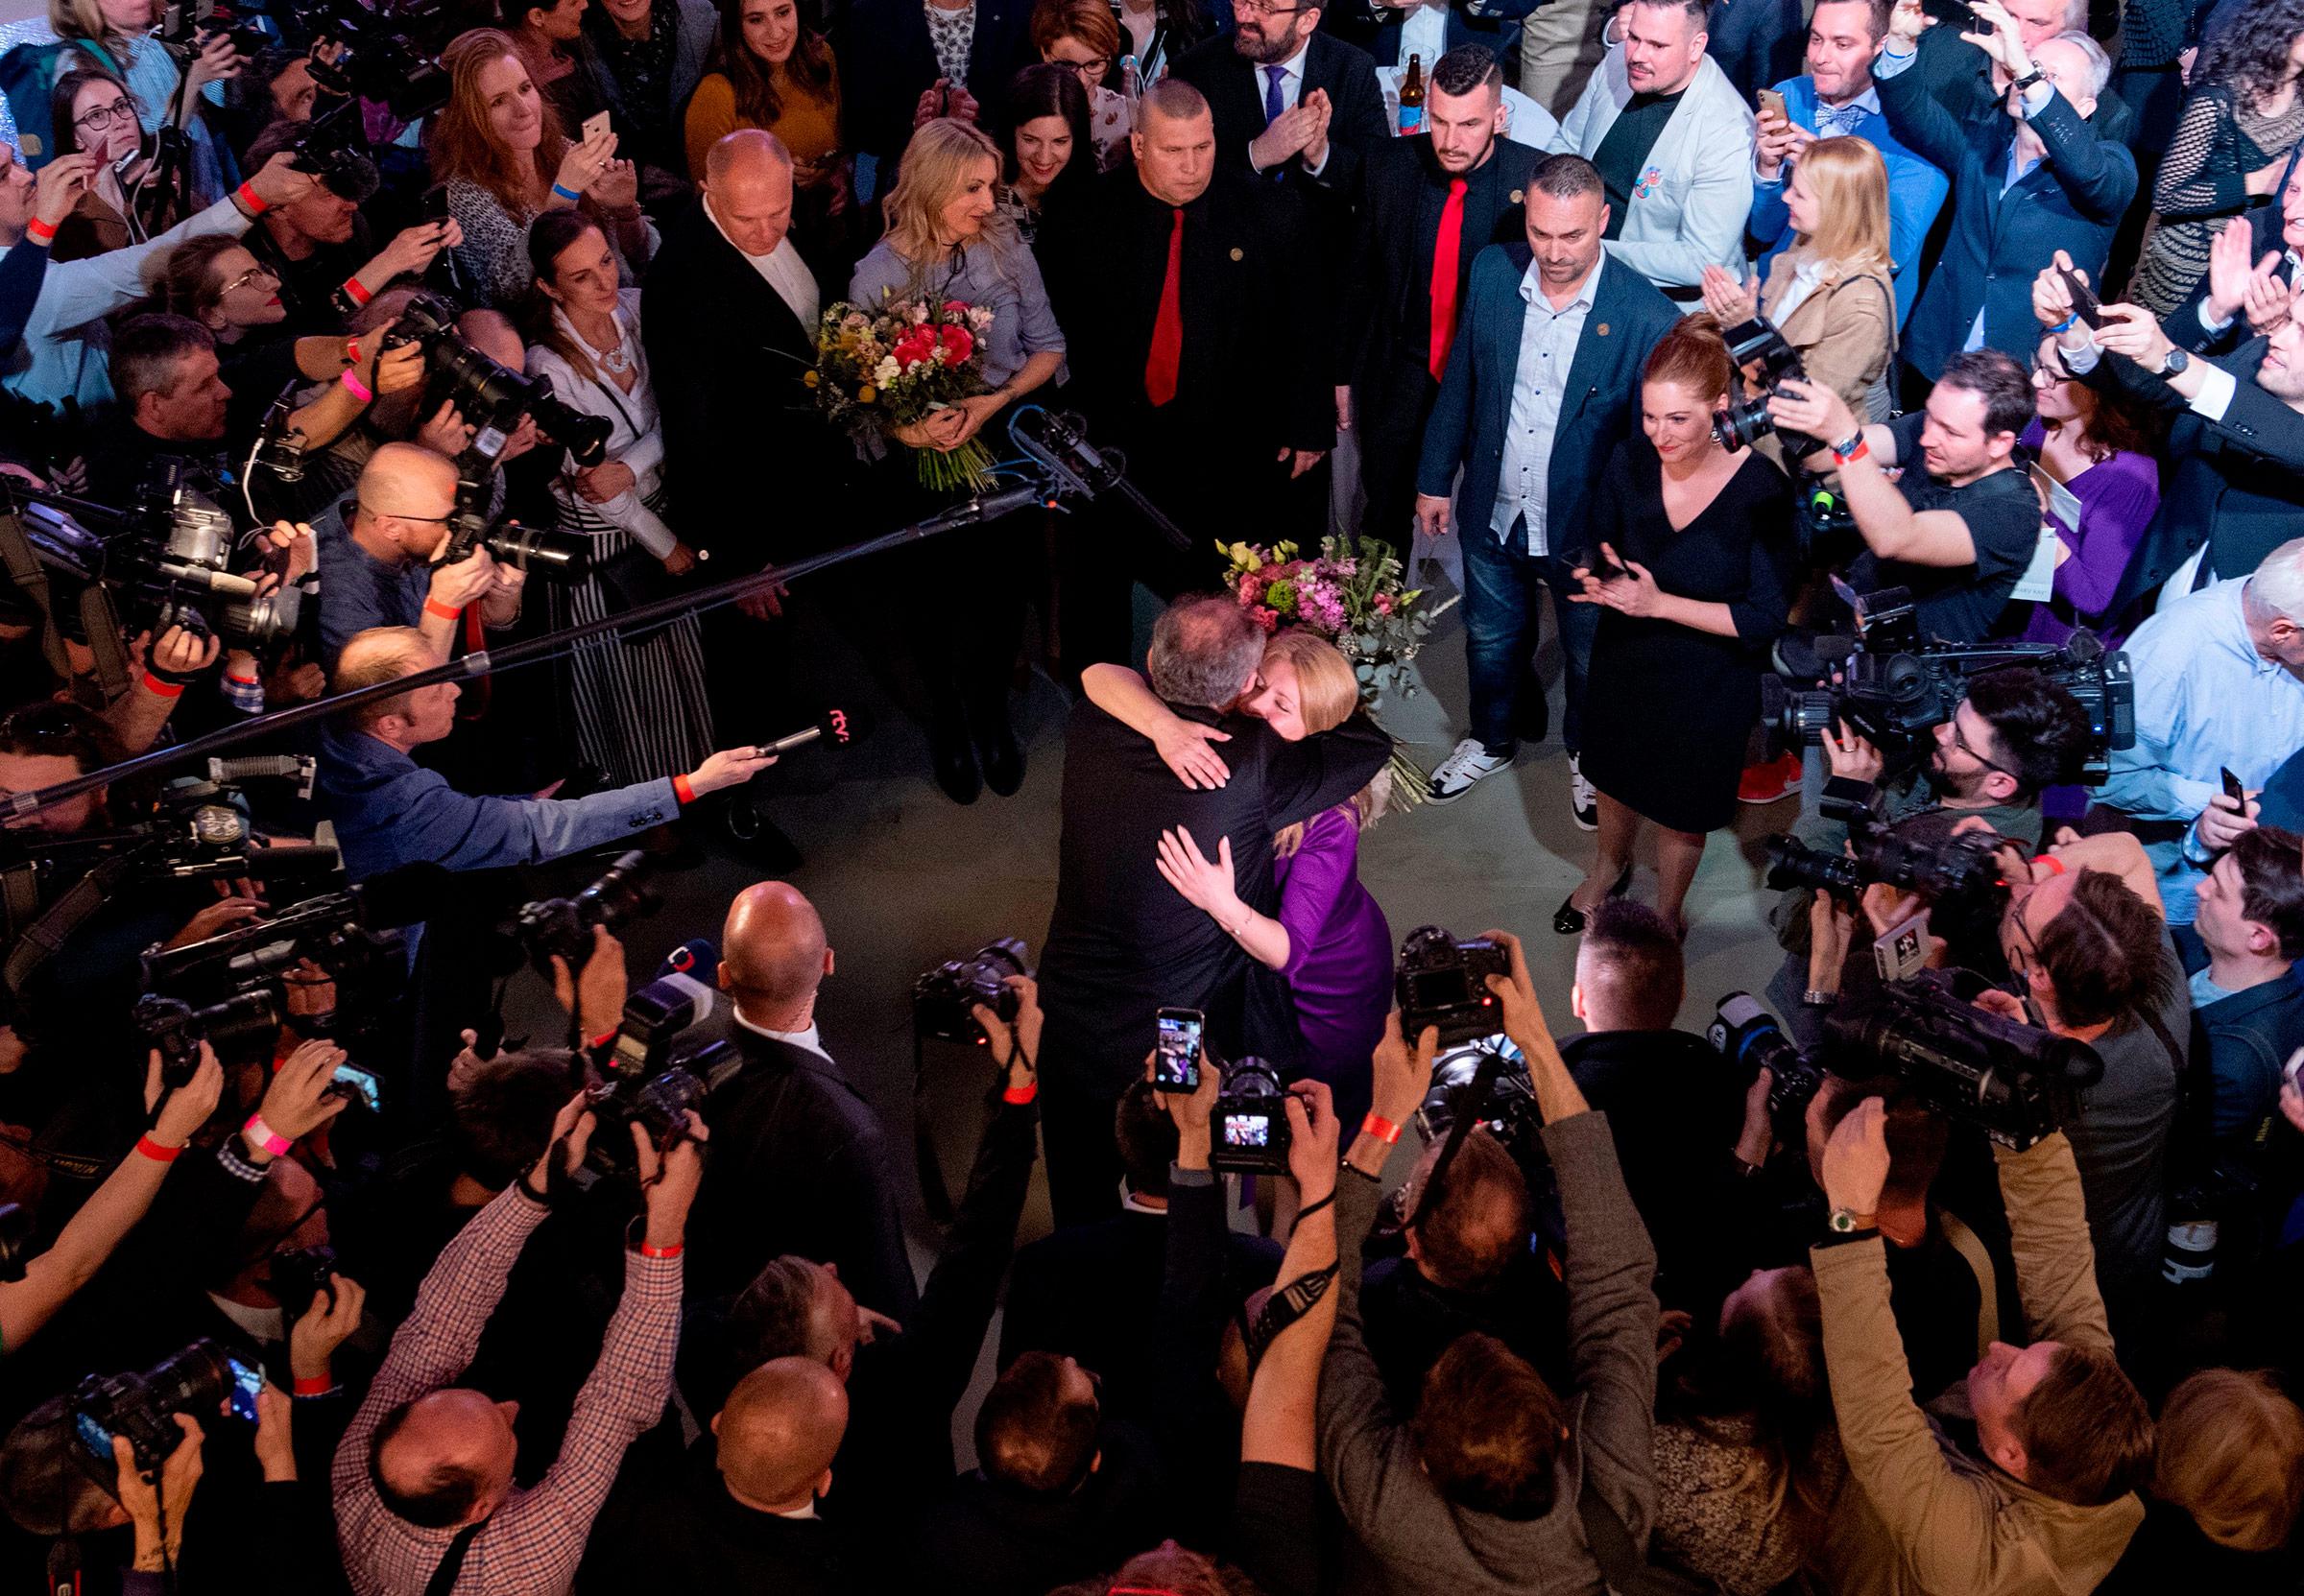 Slovak President Andrej Kiska congratulates Slovakia's President-elect Zuzana Caputova as she wins the election in Bratislava, Slovakia on March 30, 2019.